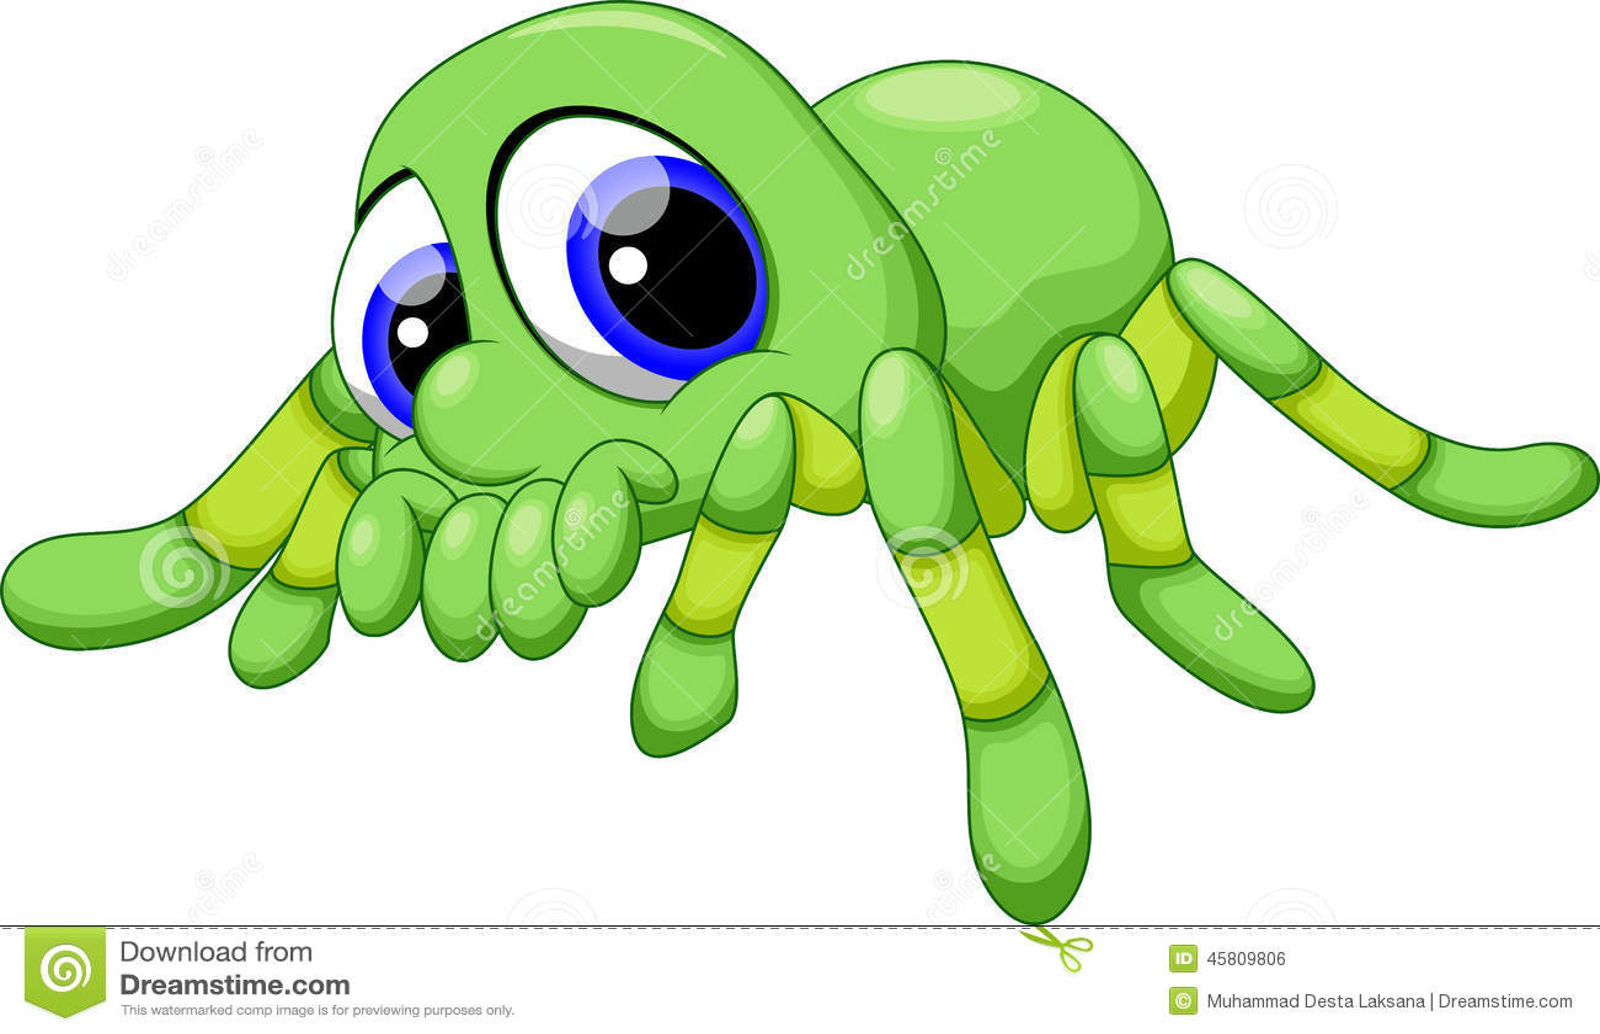 Cute Baby Tarantula Cartoon Stock Illustration - Image: 45809806